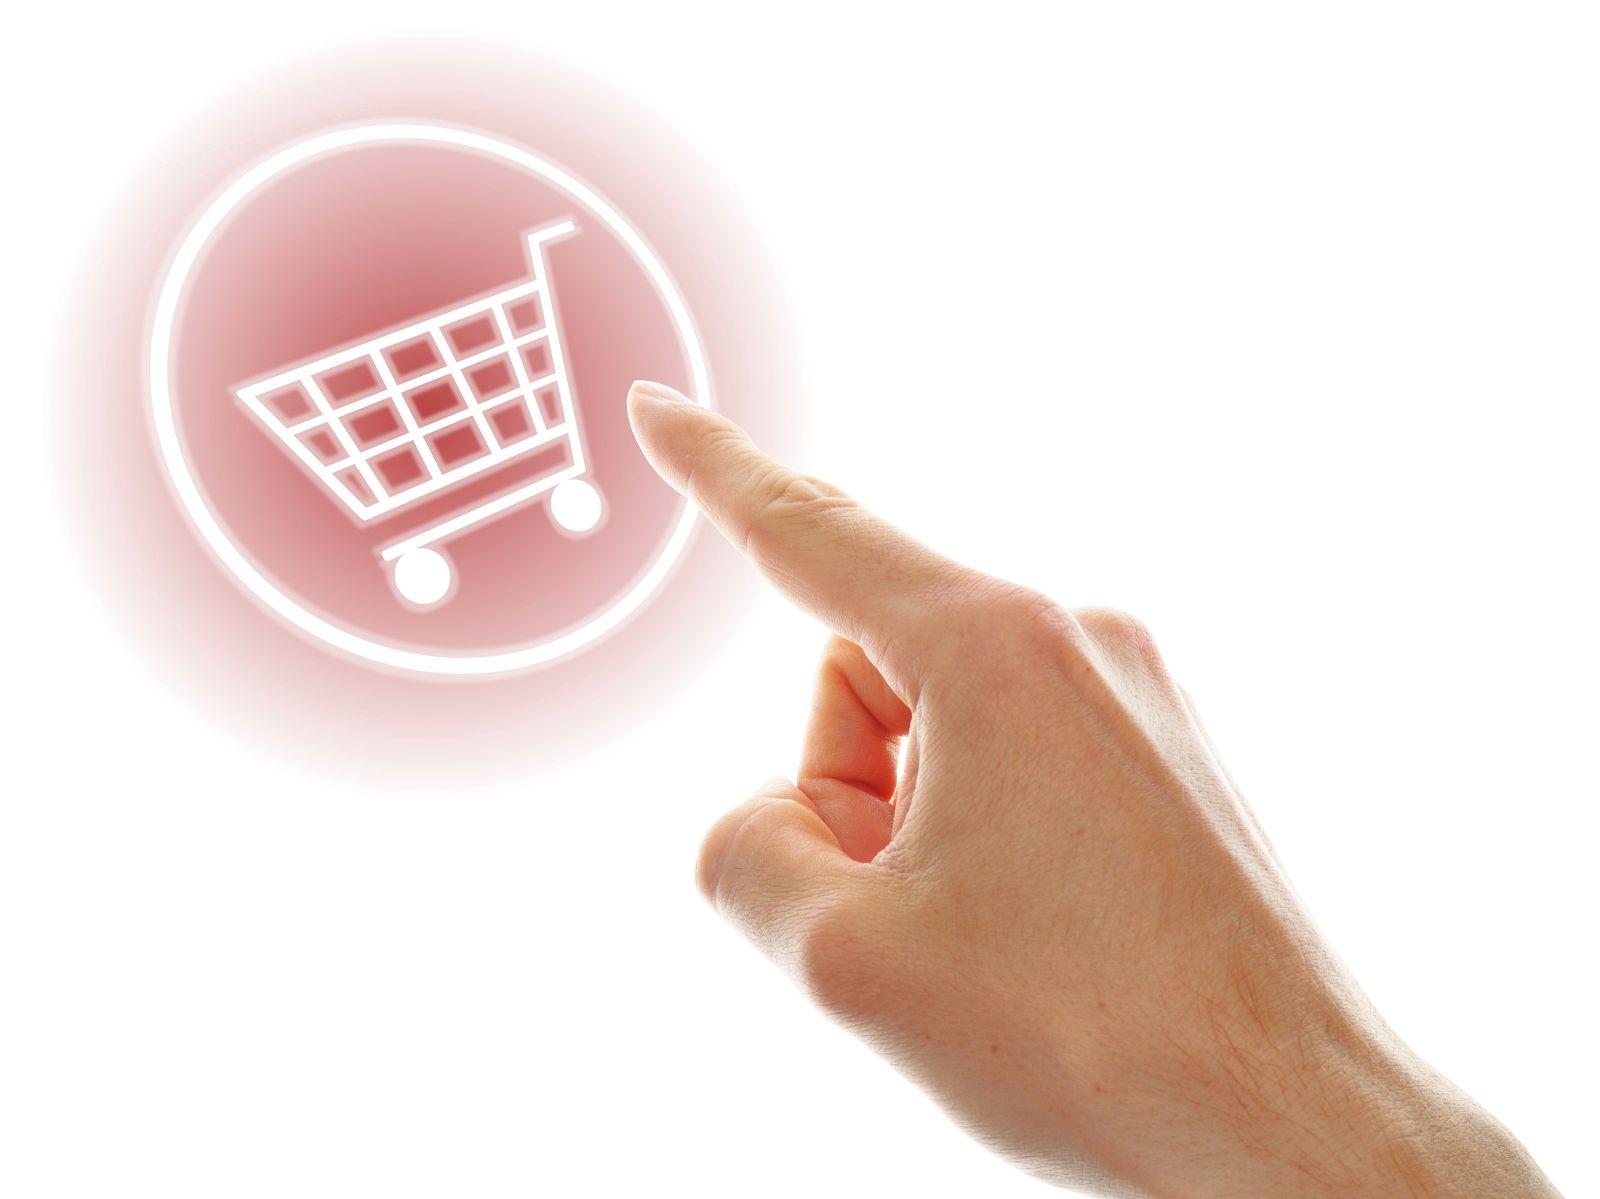 shopping-cart-l-left